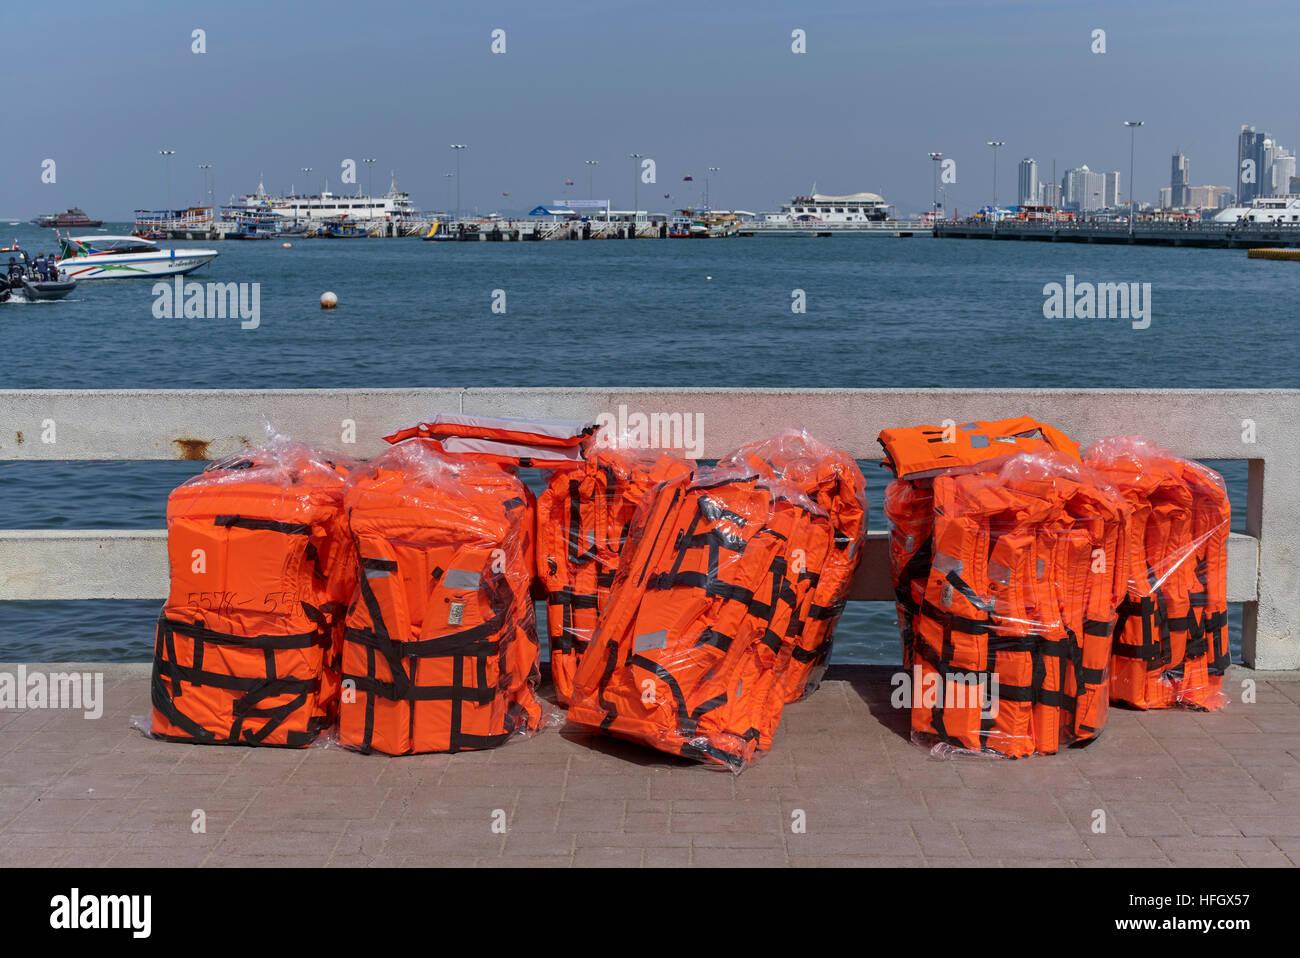 Naranja reflectante chalecos salvavidas. Foto de stock